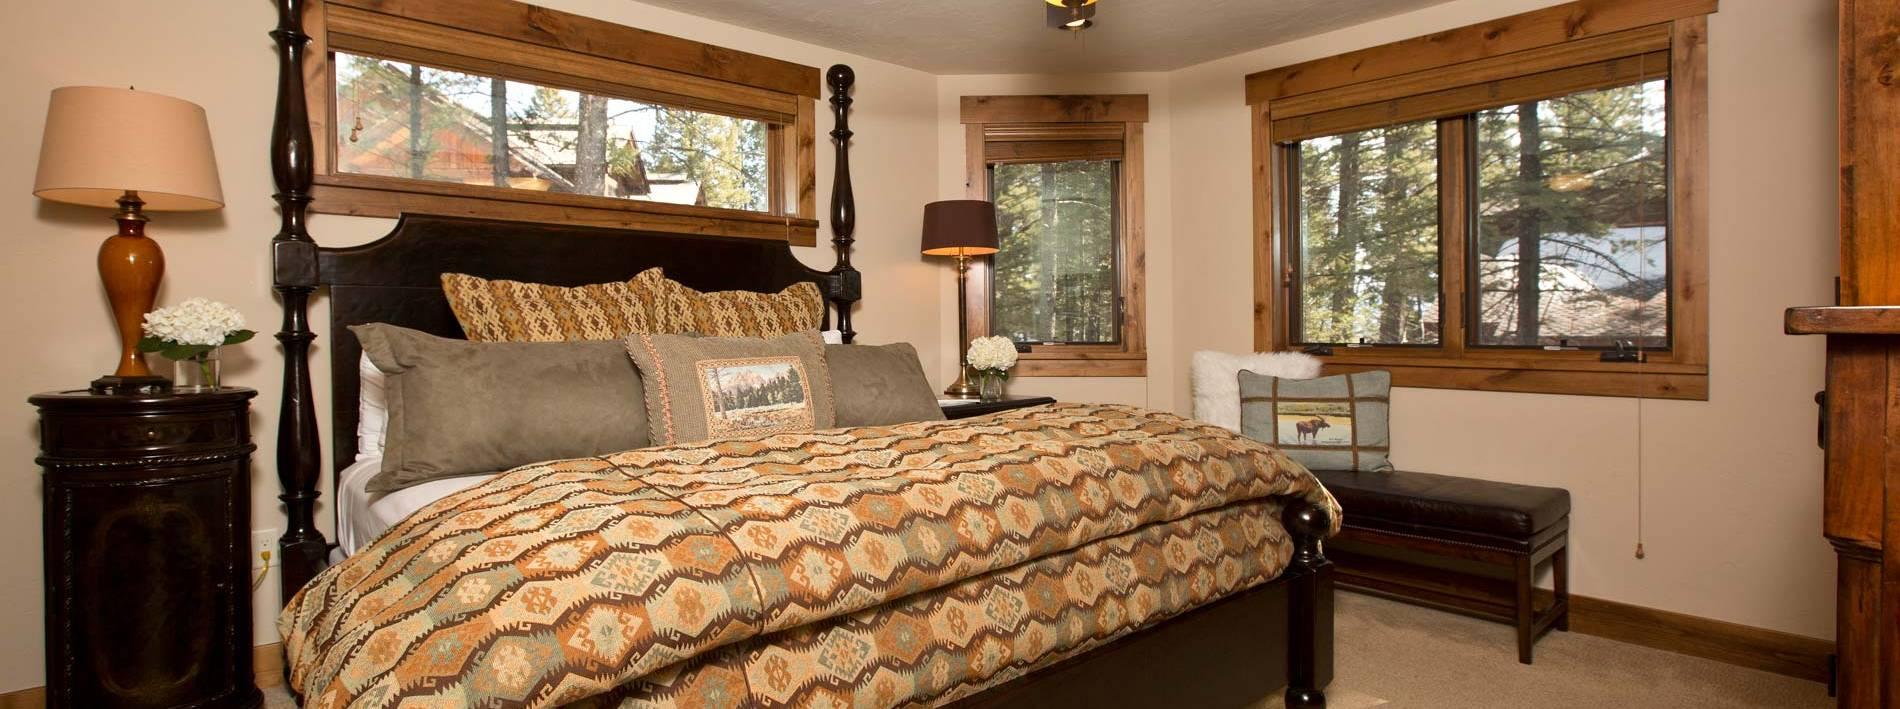 3755 Morley Dr,Jackson,Wyoming 83001,6 Bedrooms Bedrooms,6.5 BathroomsBathrooms,Private Home,3755 Morley Dr,1009